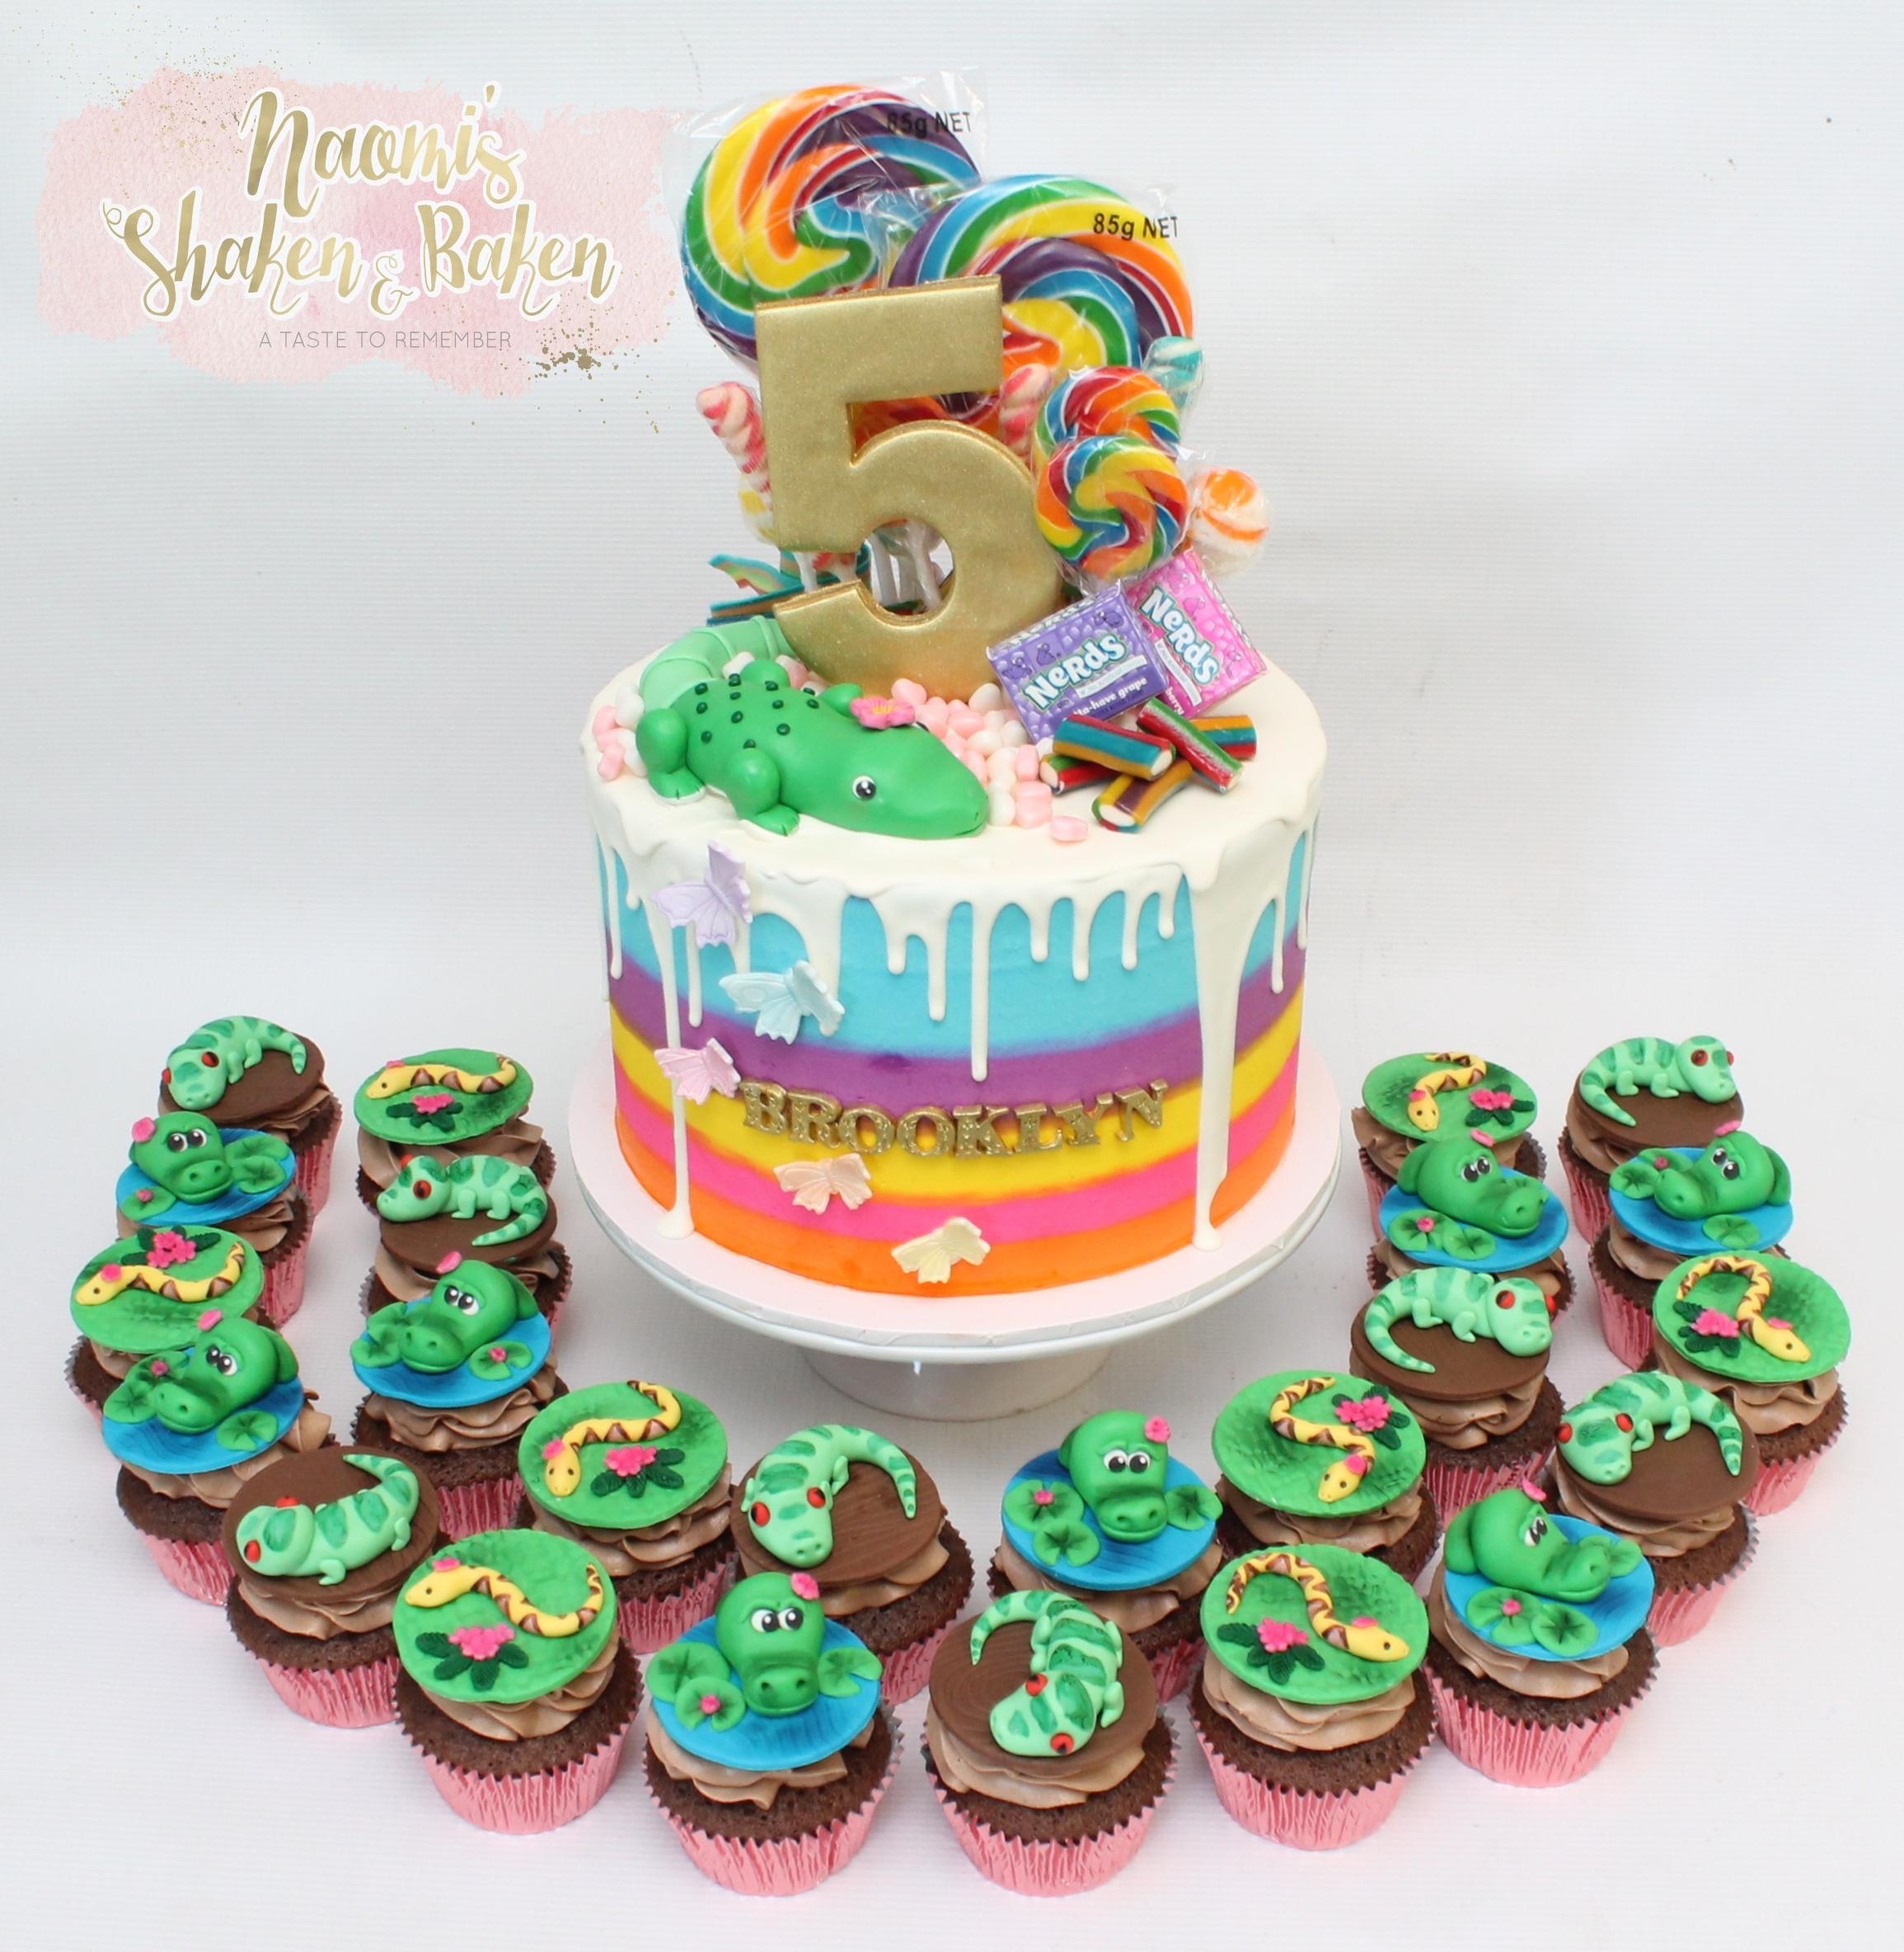 Girl reptile rainbow cake & cupcakes